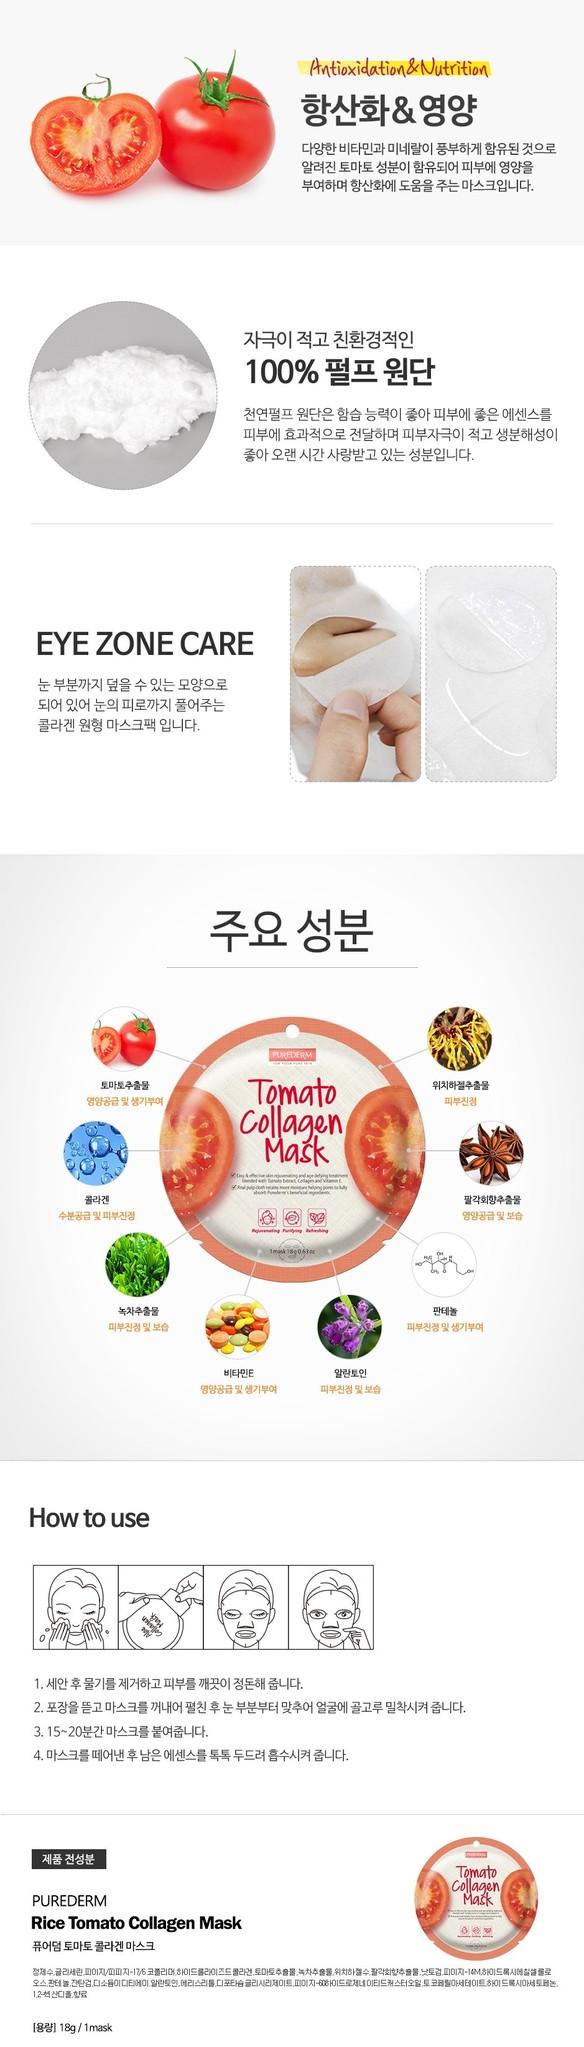 Circle Mask - Tomato Collagen-3